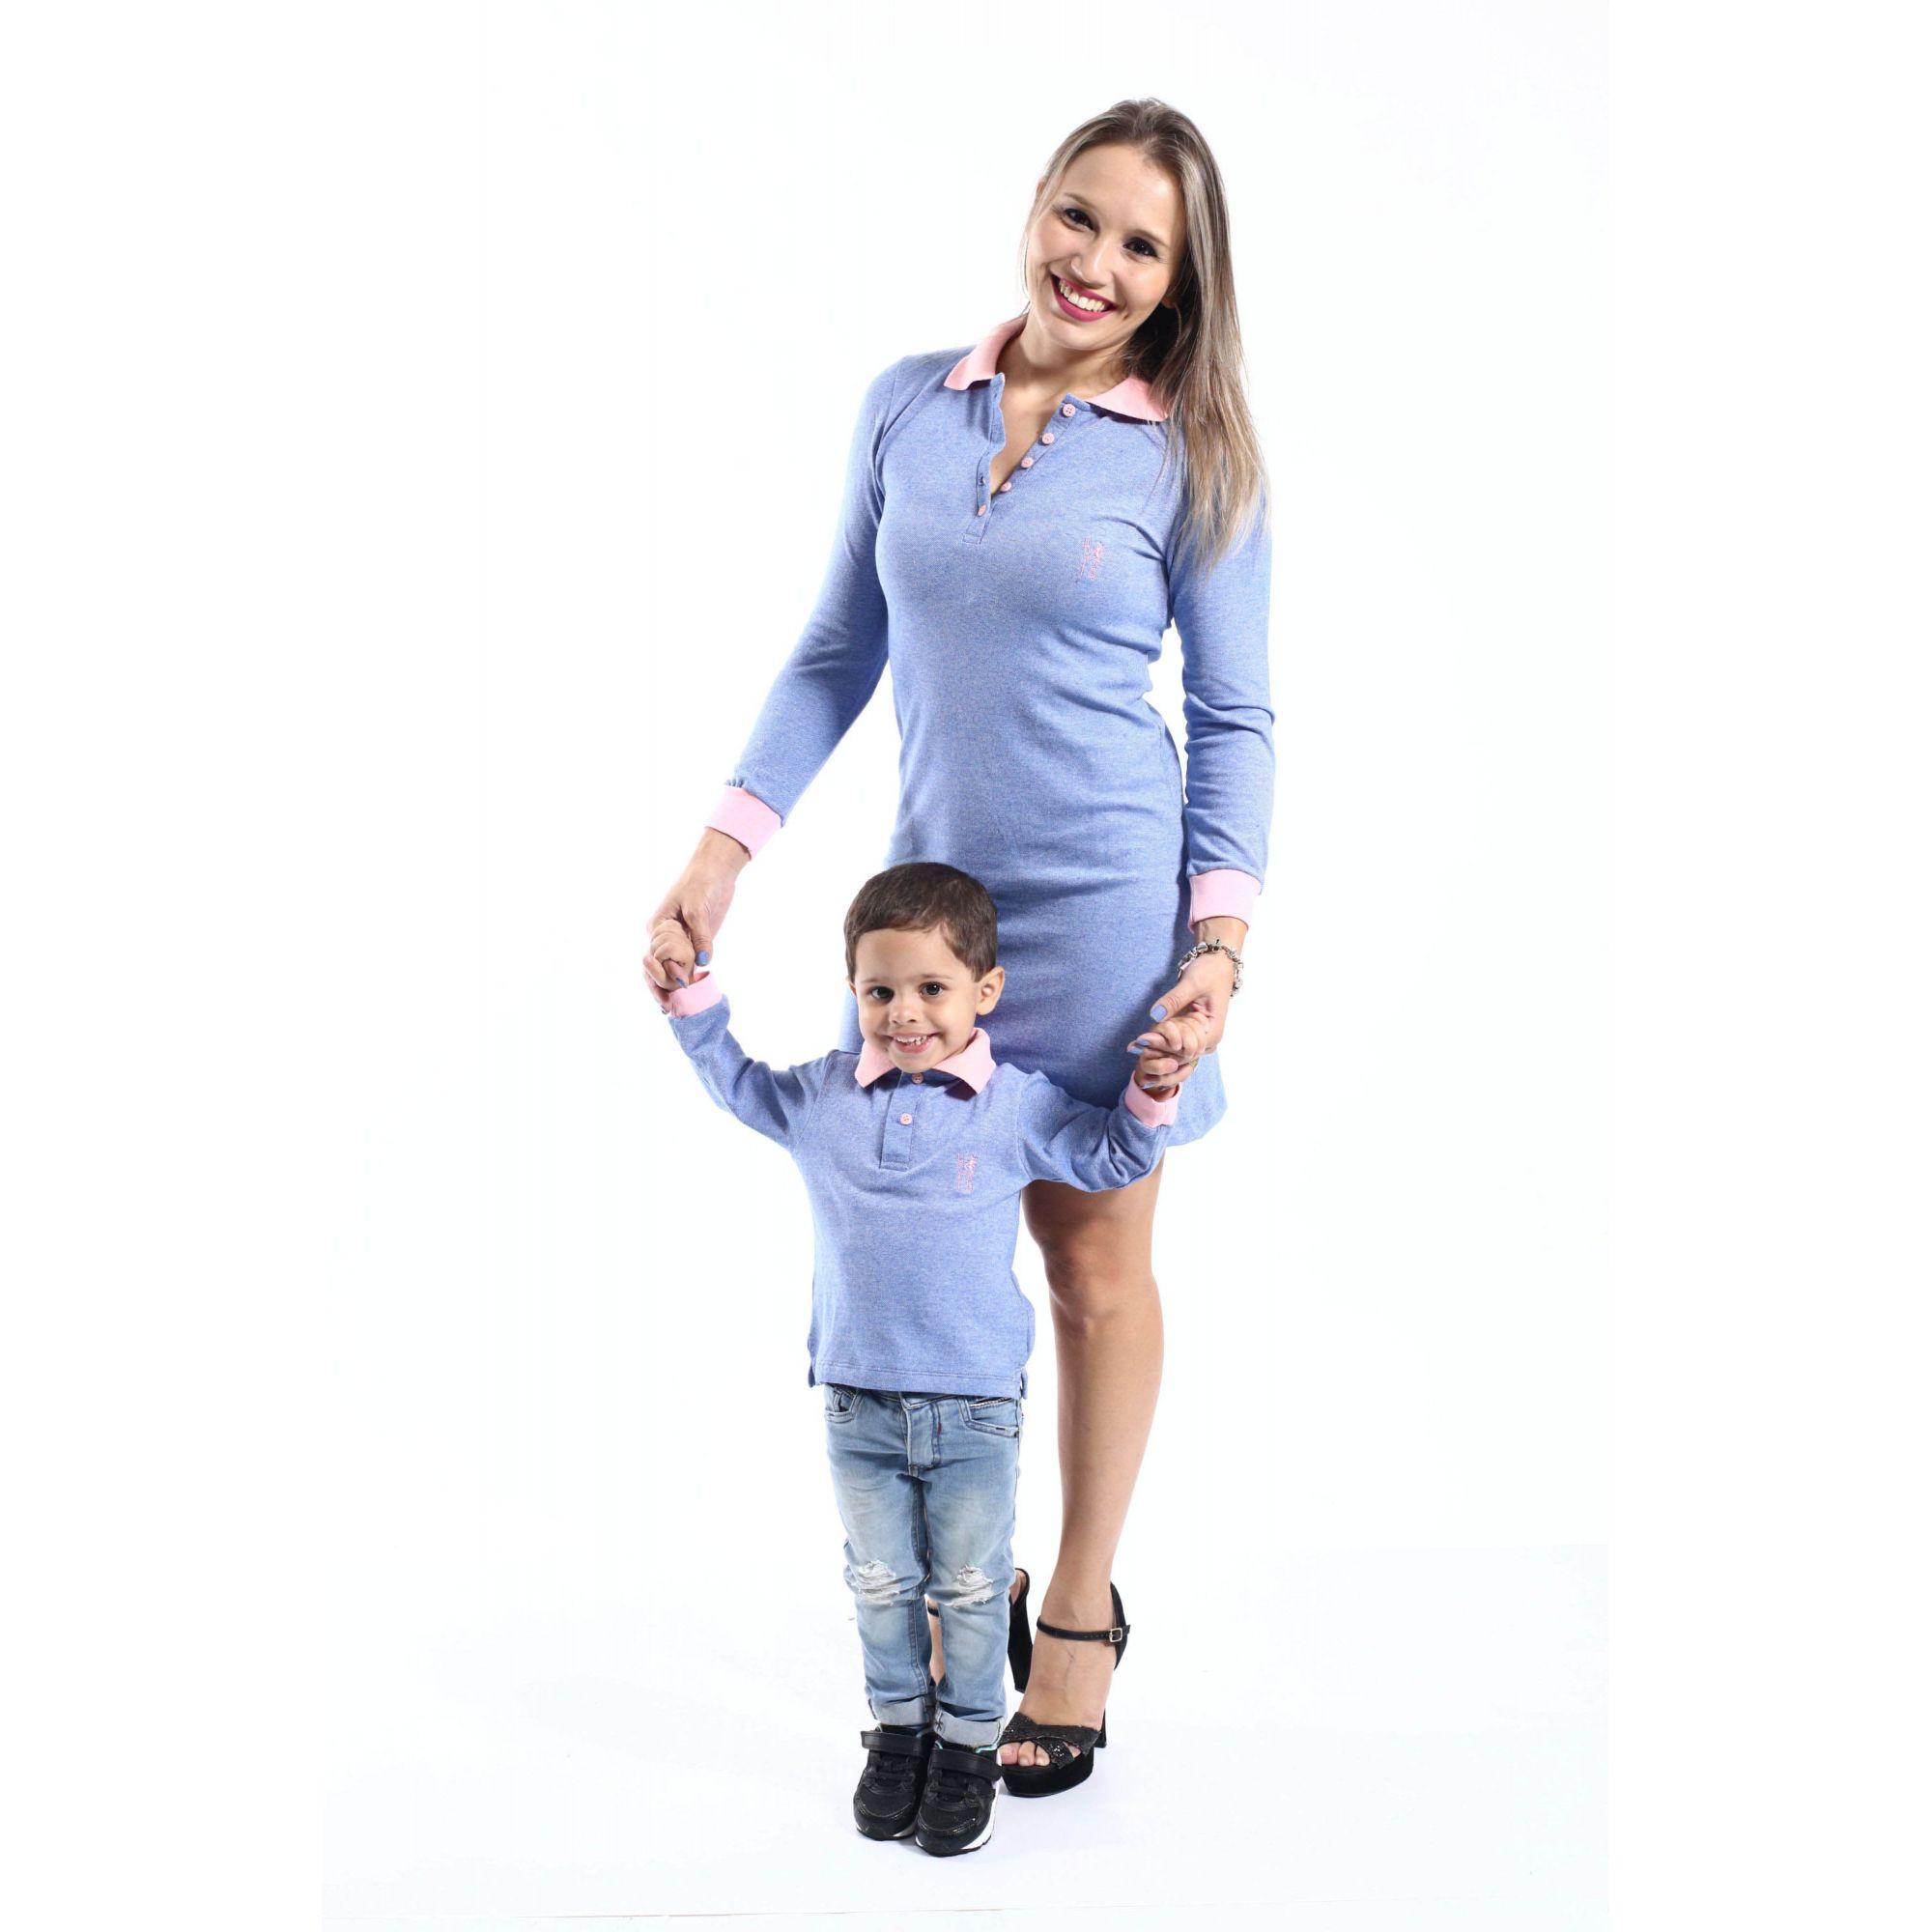 MÃE E FILHO > Kit 02 Peças Vestido + Camisa Polo [Coleção Tal Mãe Tal Filho]  - Heitor Fashion Brazil